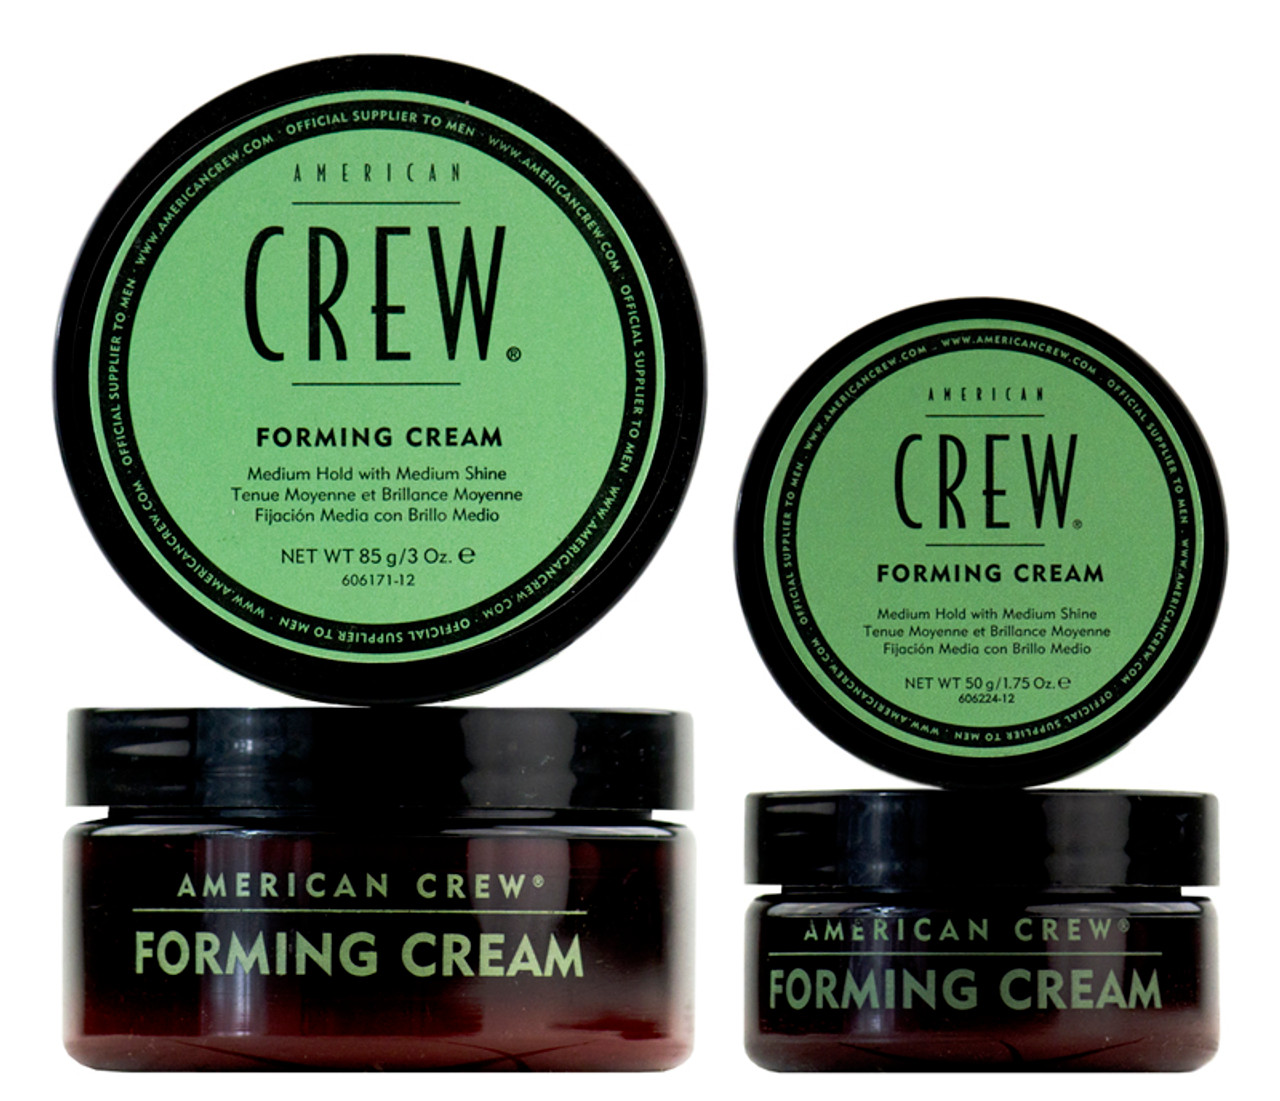 American Crew Forming Cream Medium Hold Amp Medium Shine Sleekshop Com Formerly Sleekhair